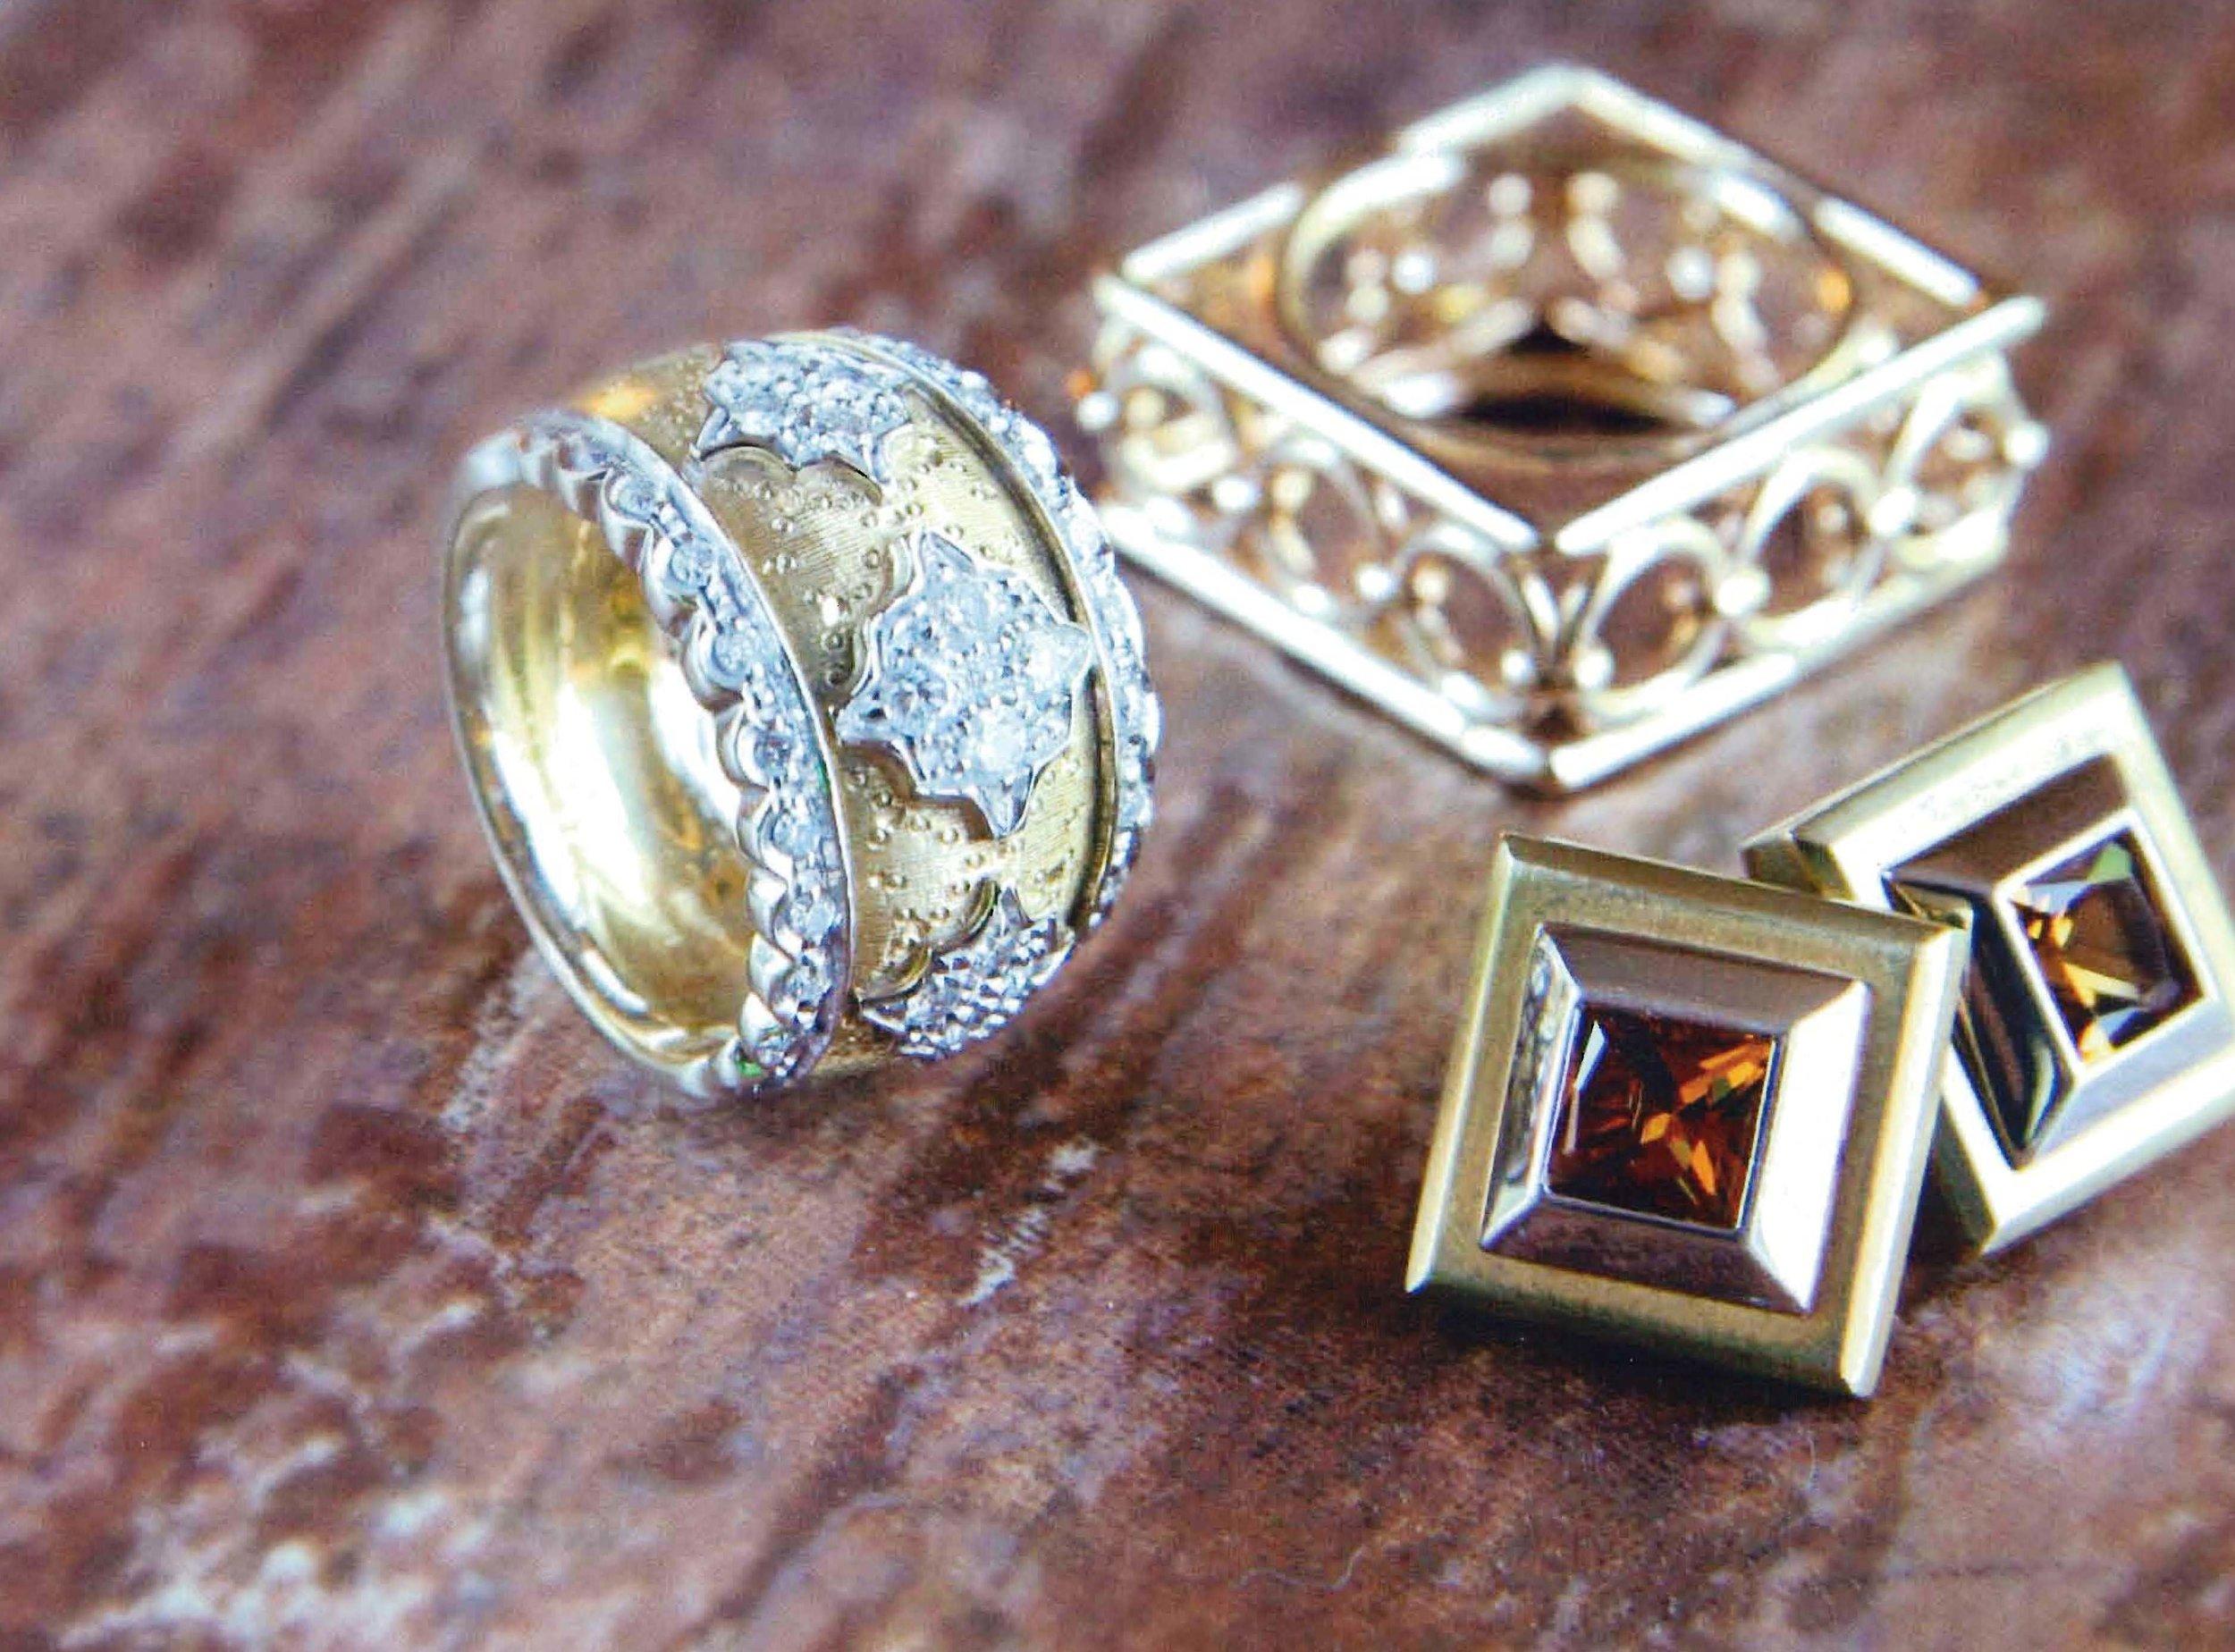 14kt Square Ring, 18kt Tapered Dome Band, 18kt Gold Bezel Citrine Earrings